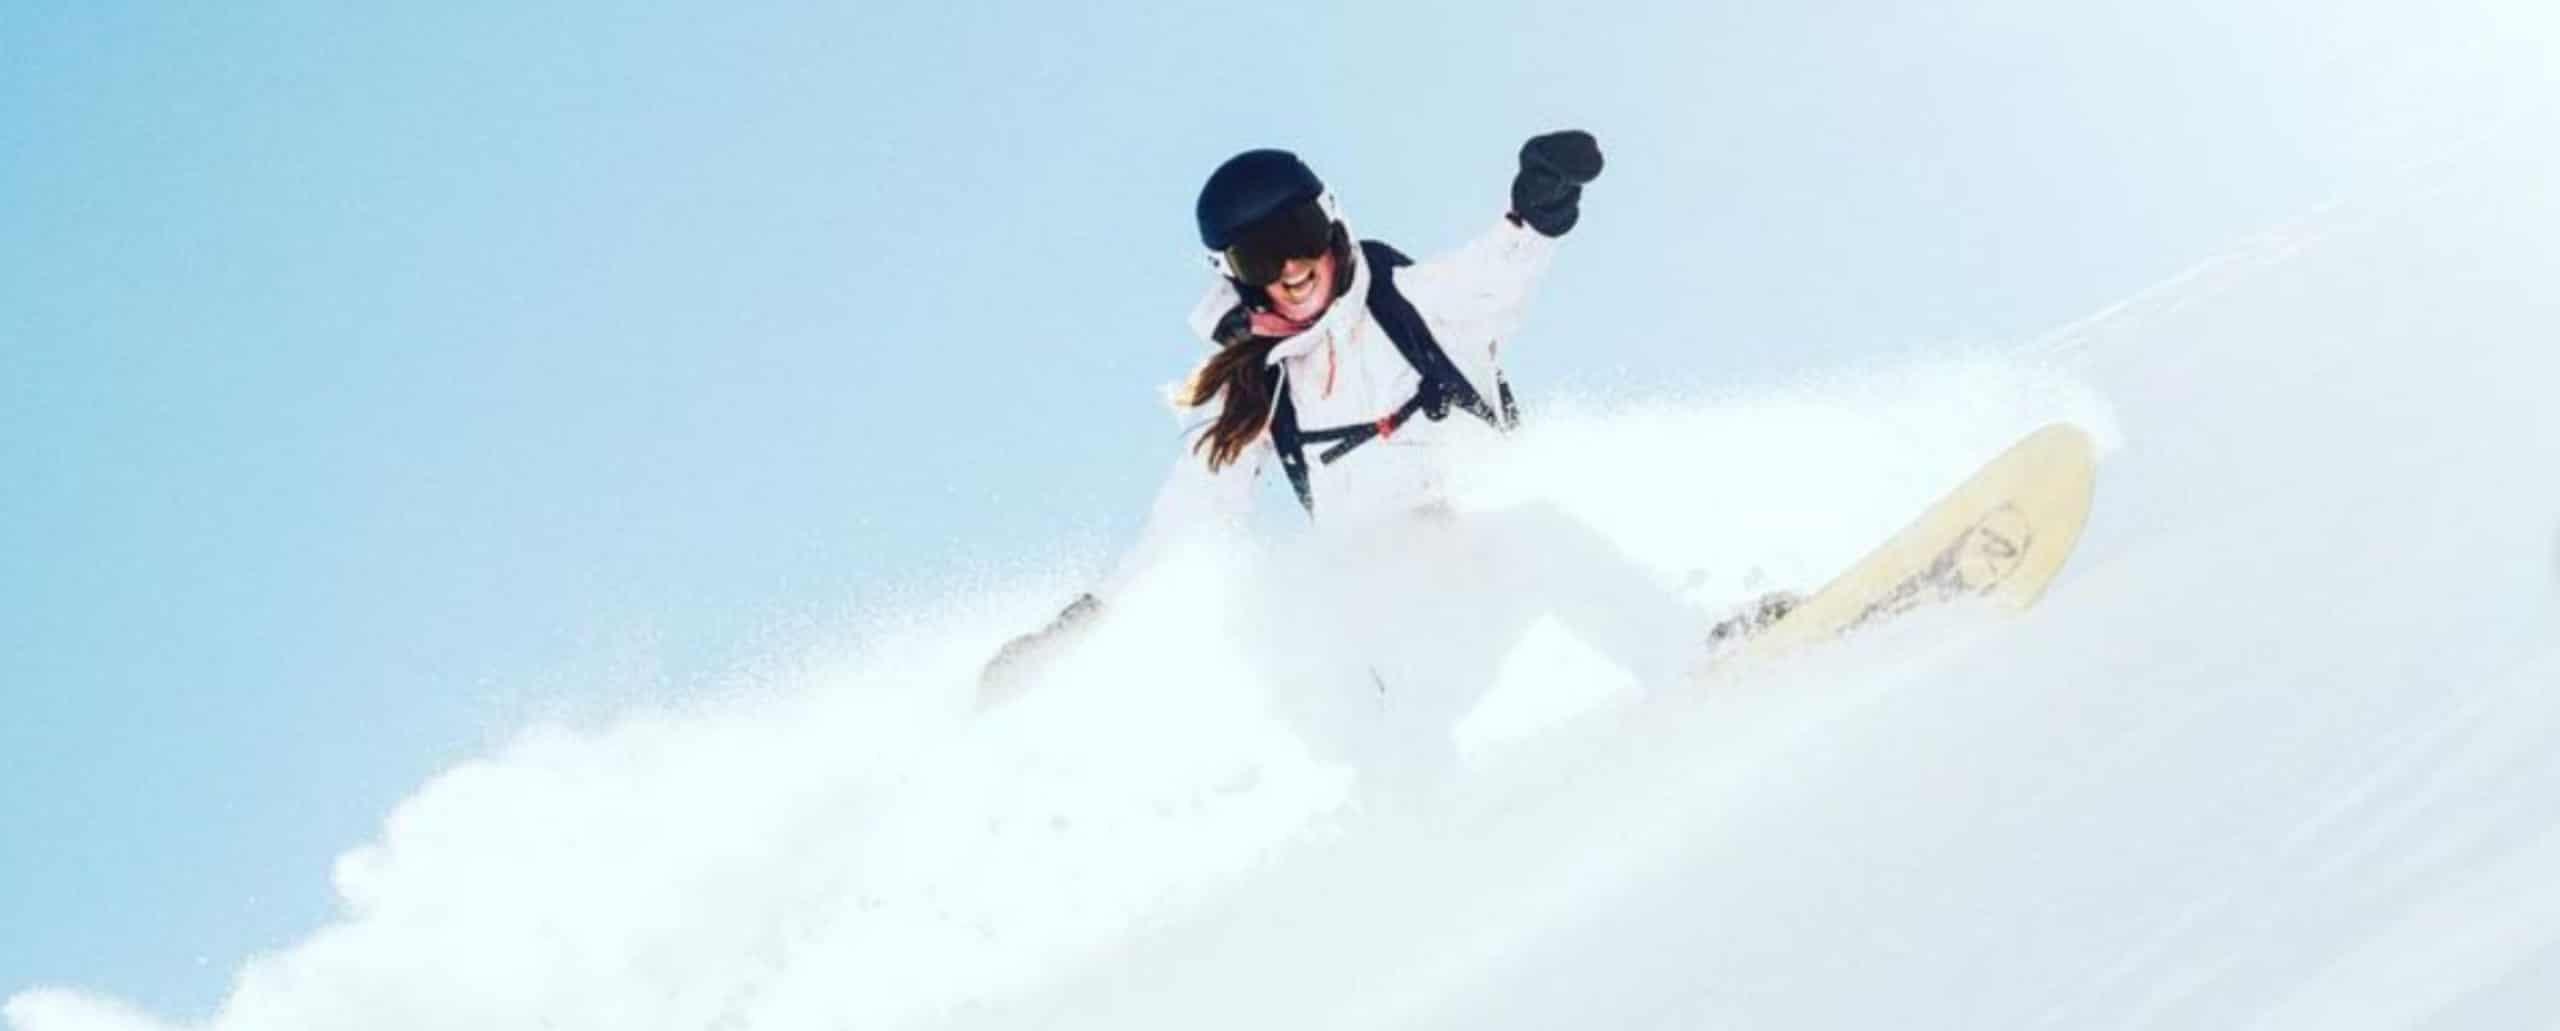 AMBAMBASSADEUR COVER PAULINE LE ROUX EIVY GIRLS CAMP SNOWBOARD